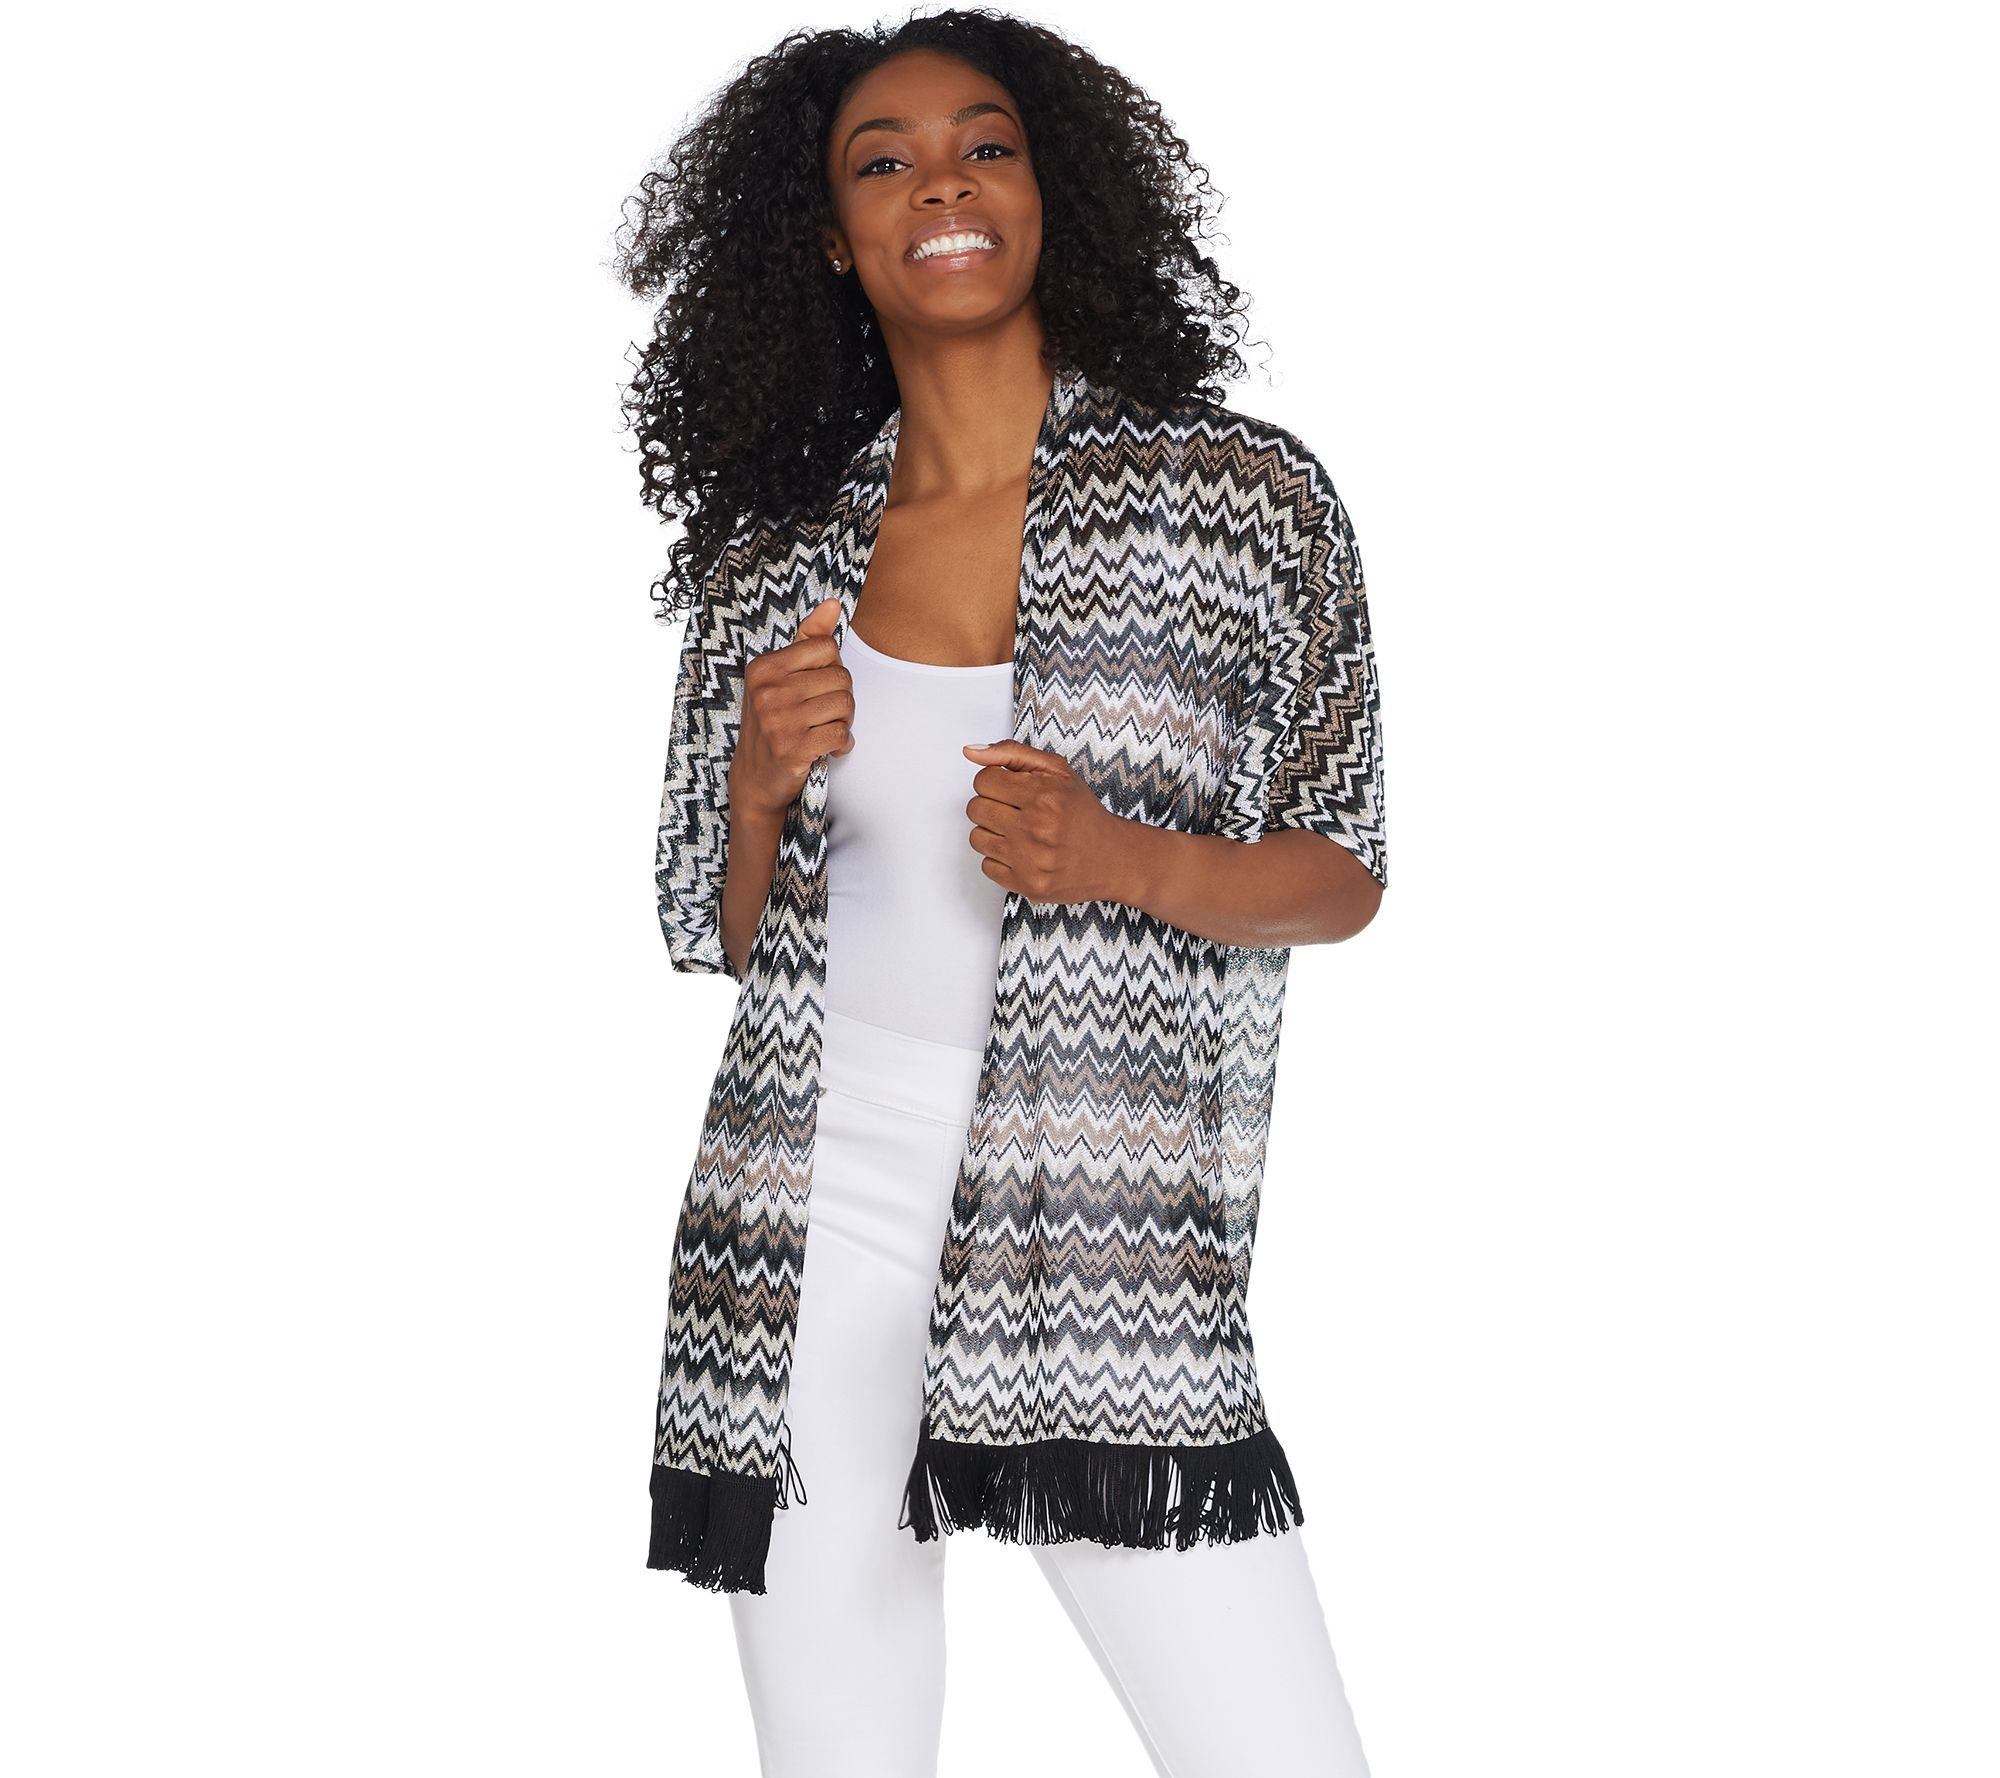 92193103ebf GRAVER Susan Graver Novelty Knit Kimono with Tassel Trim - Page 1 ...